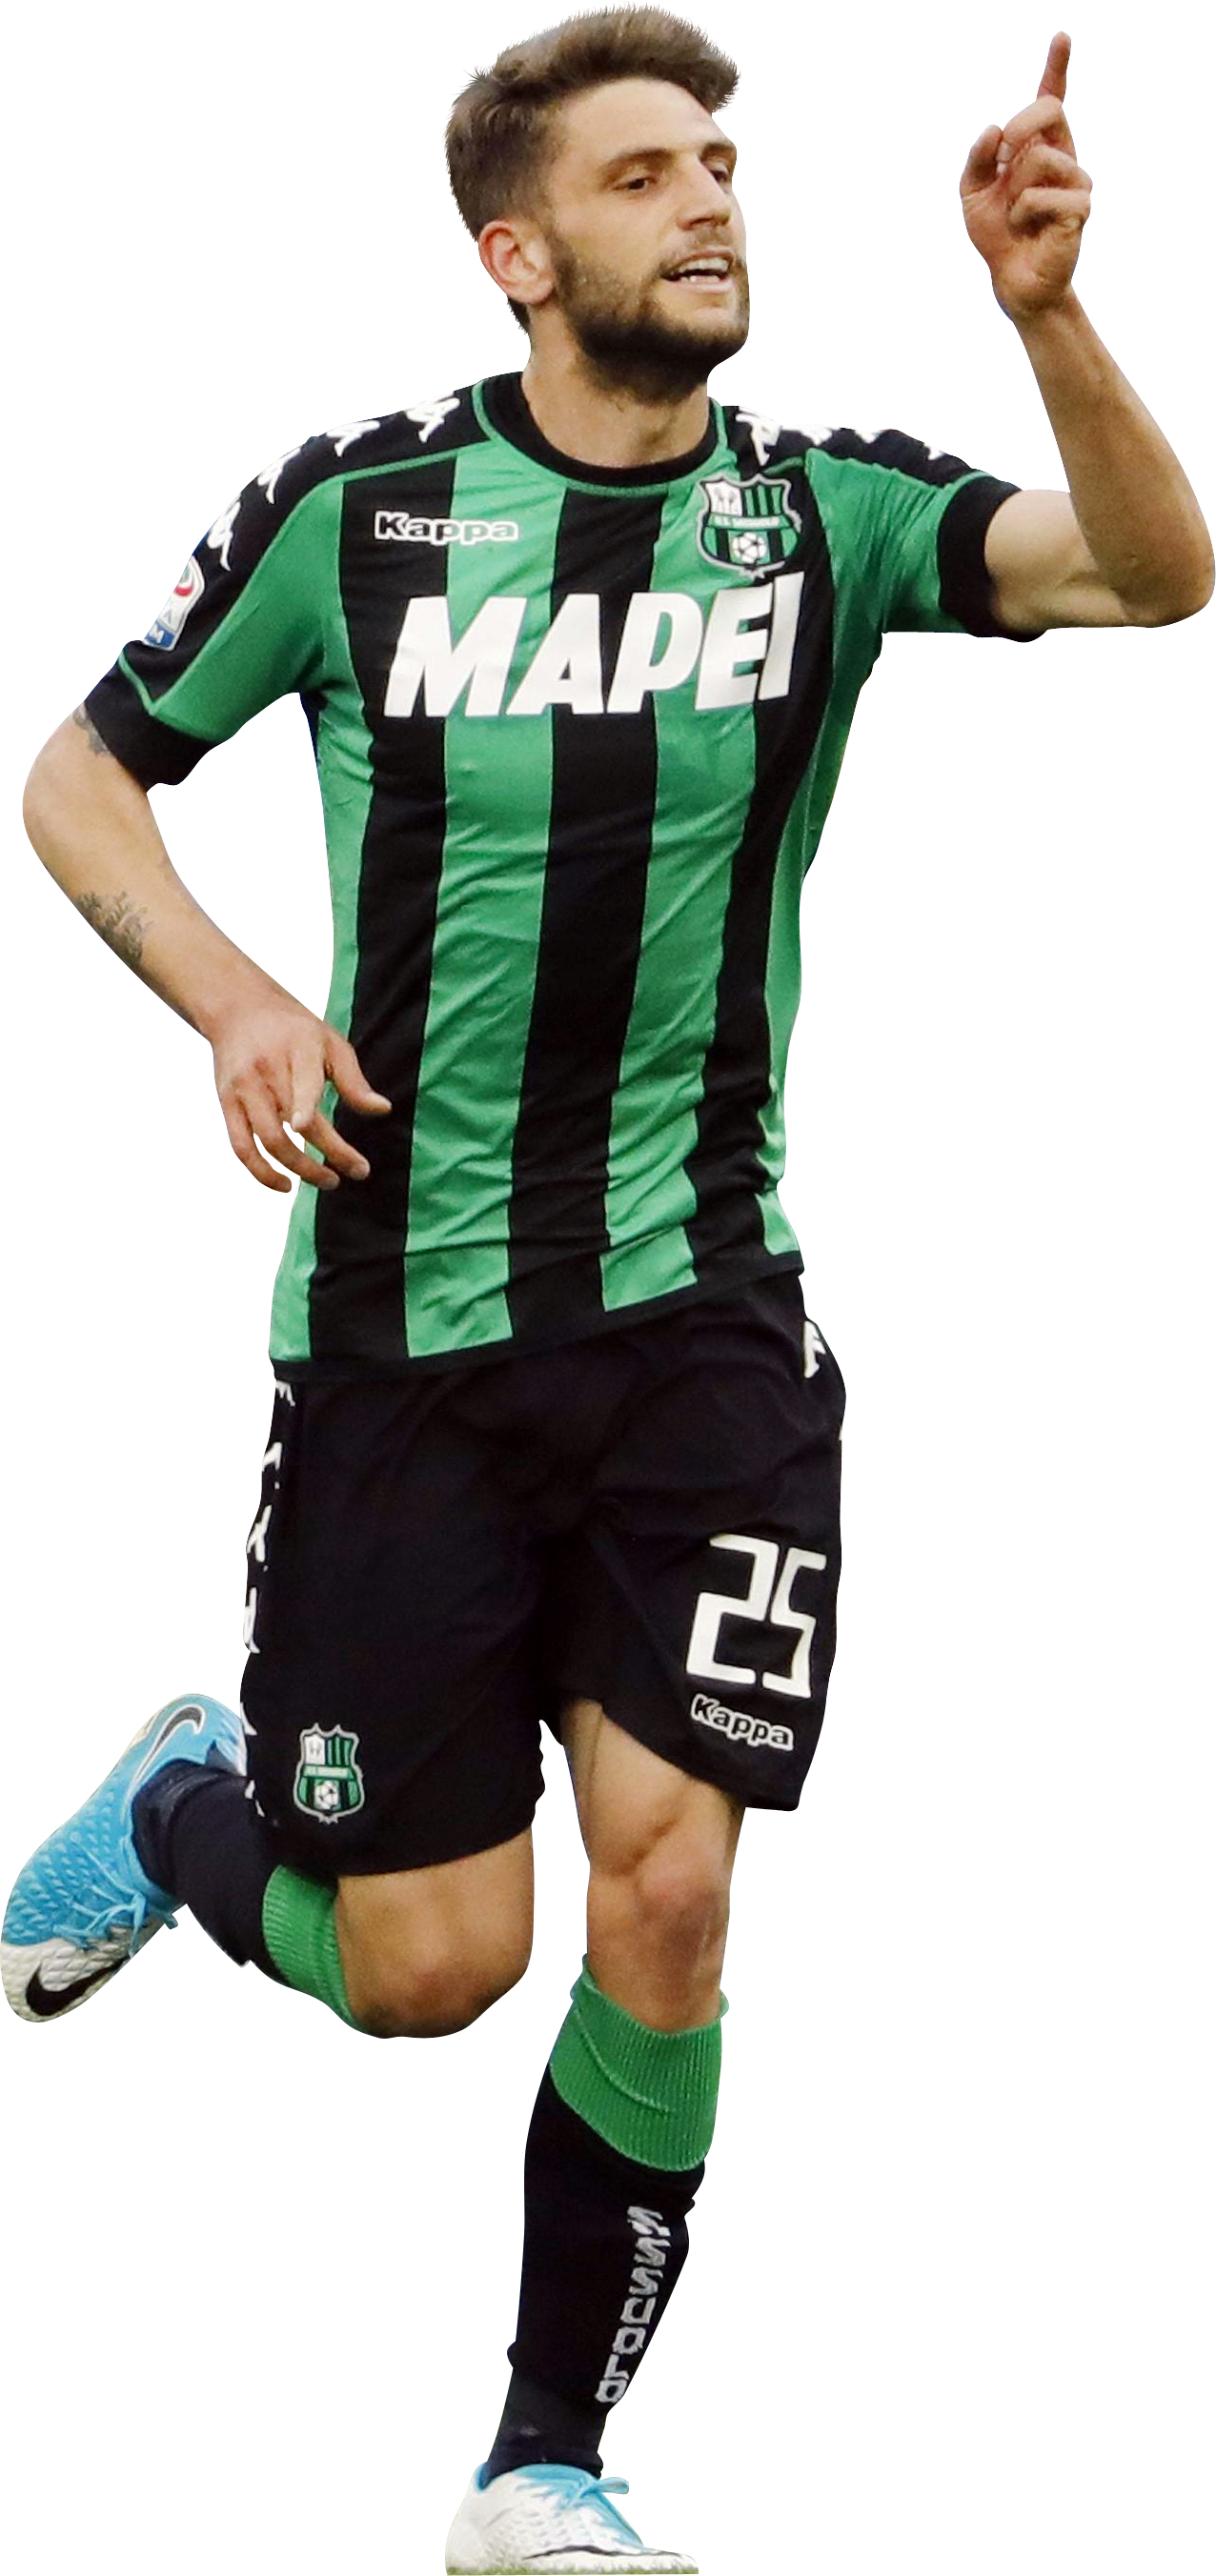 Domenico Berardirender